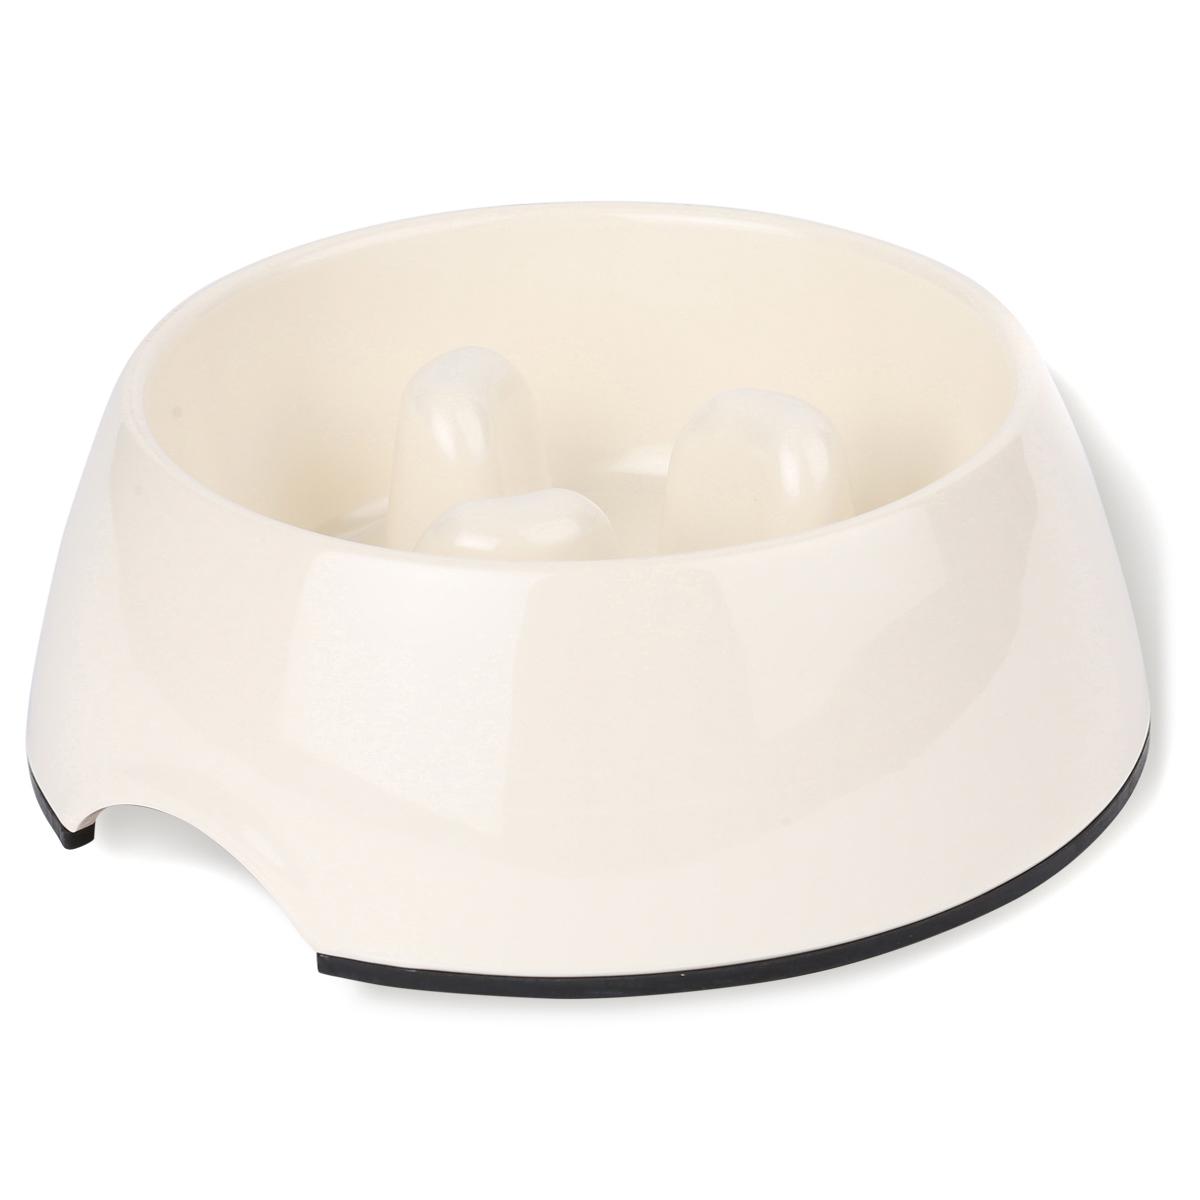 karlie anti schling napf wei g nstig kaufen bei zooroyal. Black Bedroom Furniture Sets. Home Design Ideas